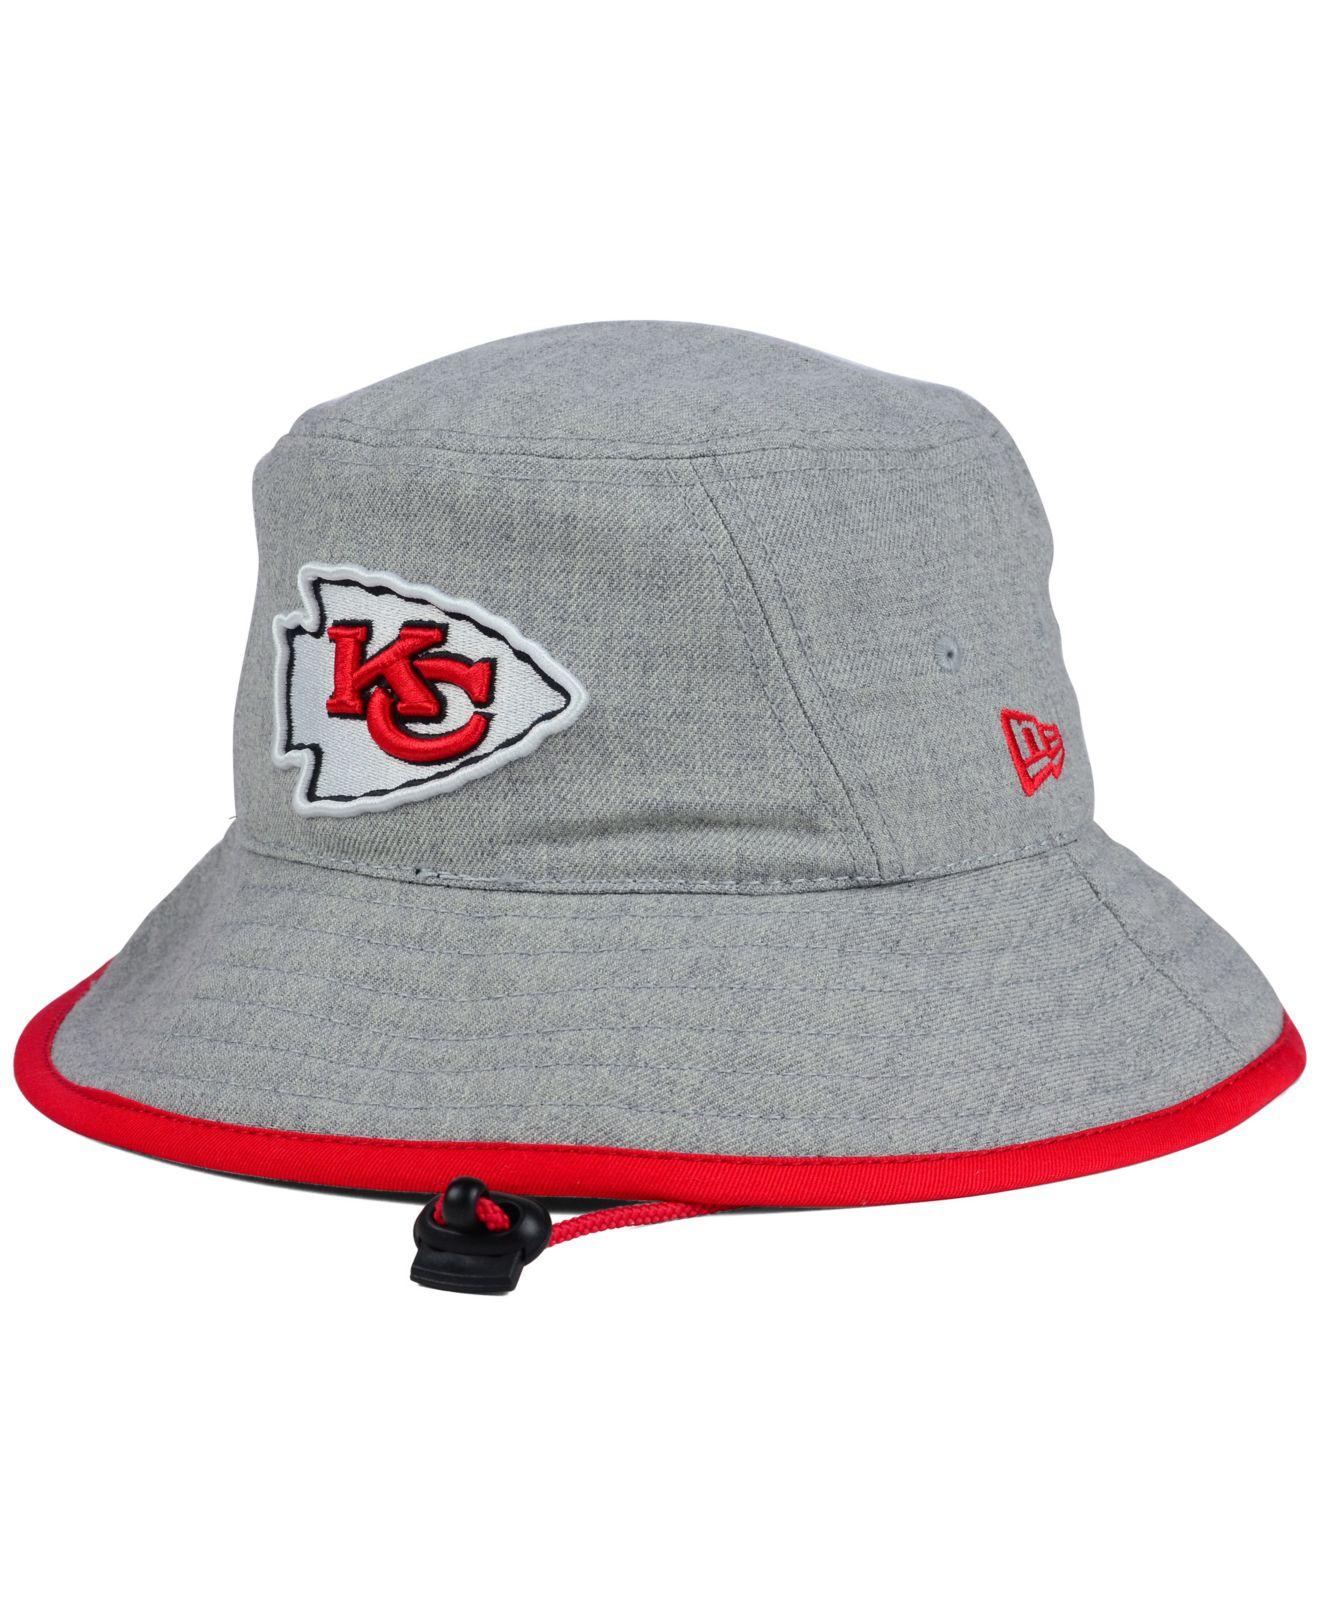 83f6845fa0d9b ... usa lyst ktz kansas city chiefs nfl heather gray bucket hat in gray  79beb 9707e buy iowa state ...